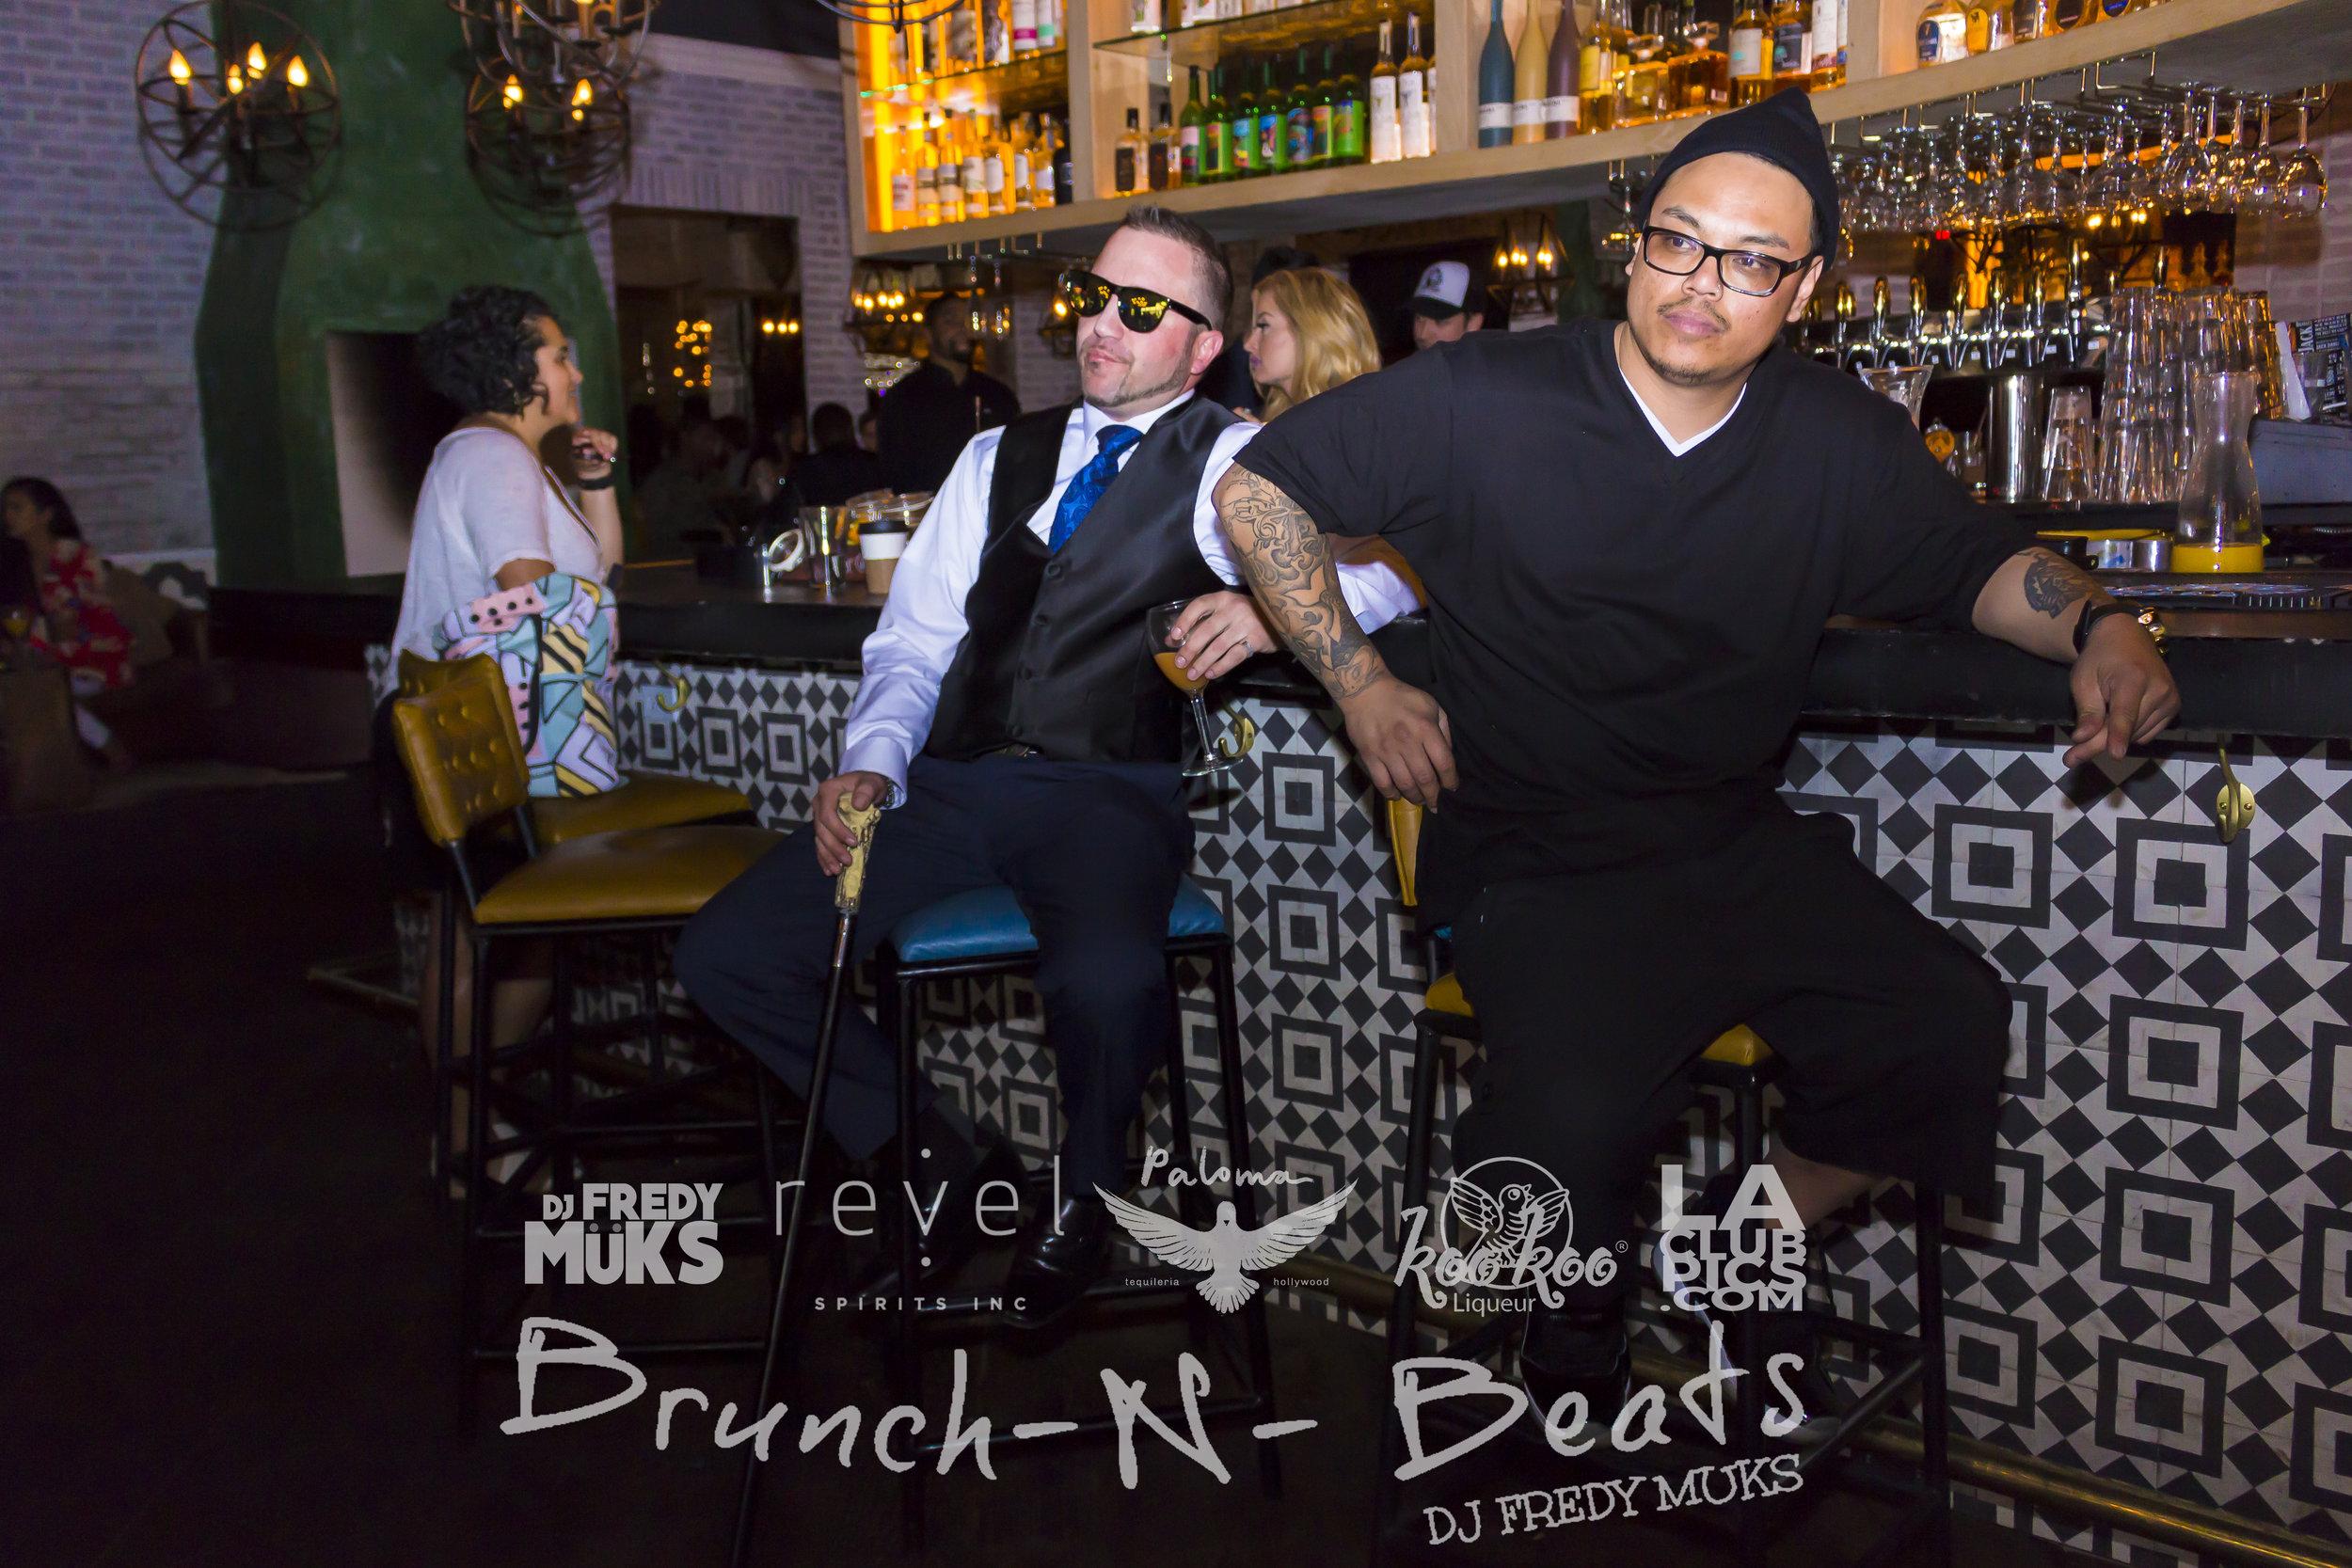 Brunch-N-Beats - Paloma Hollywood - 02-25-18_86.jpg